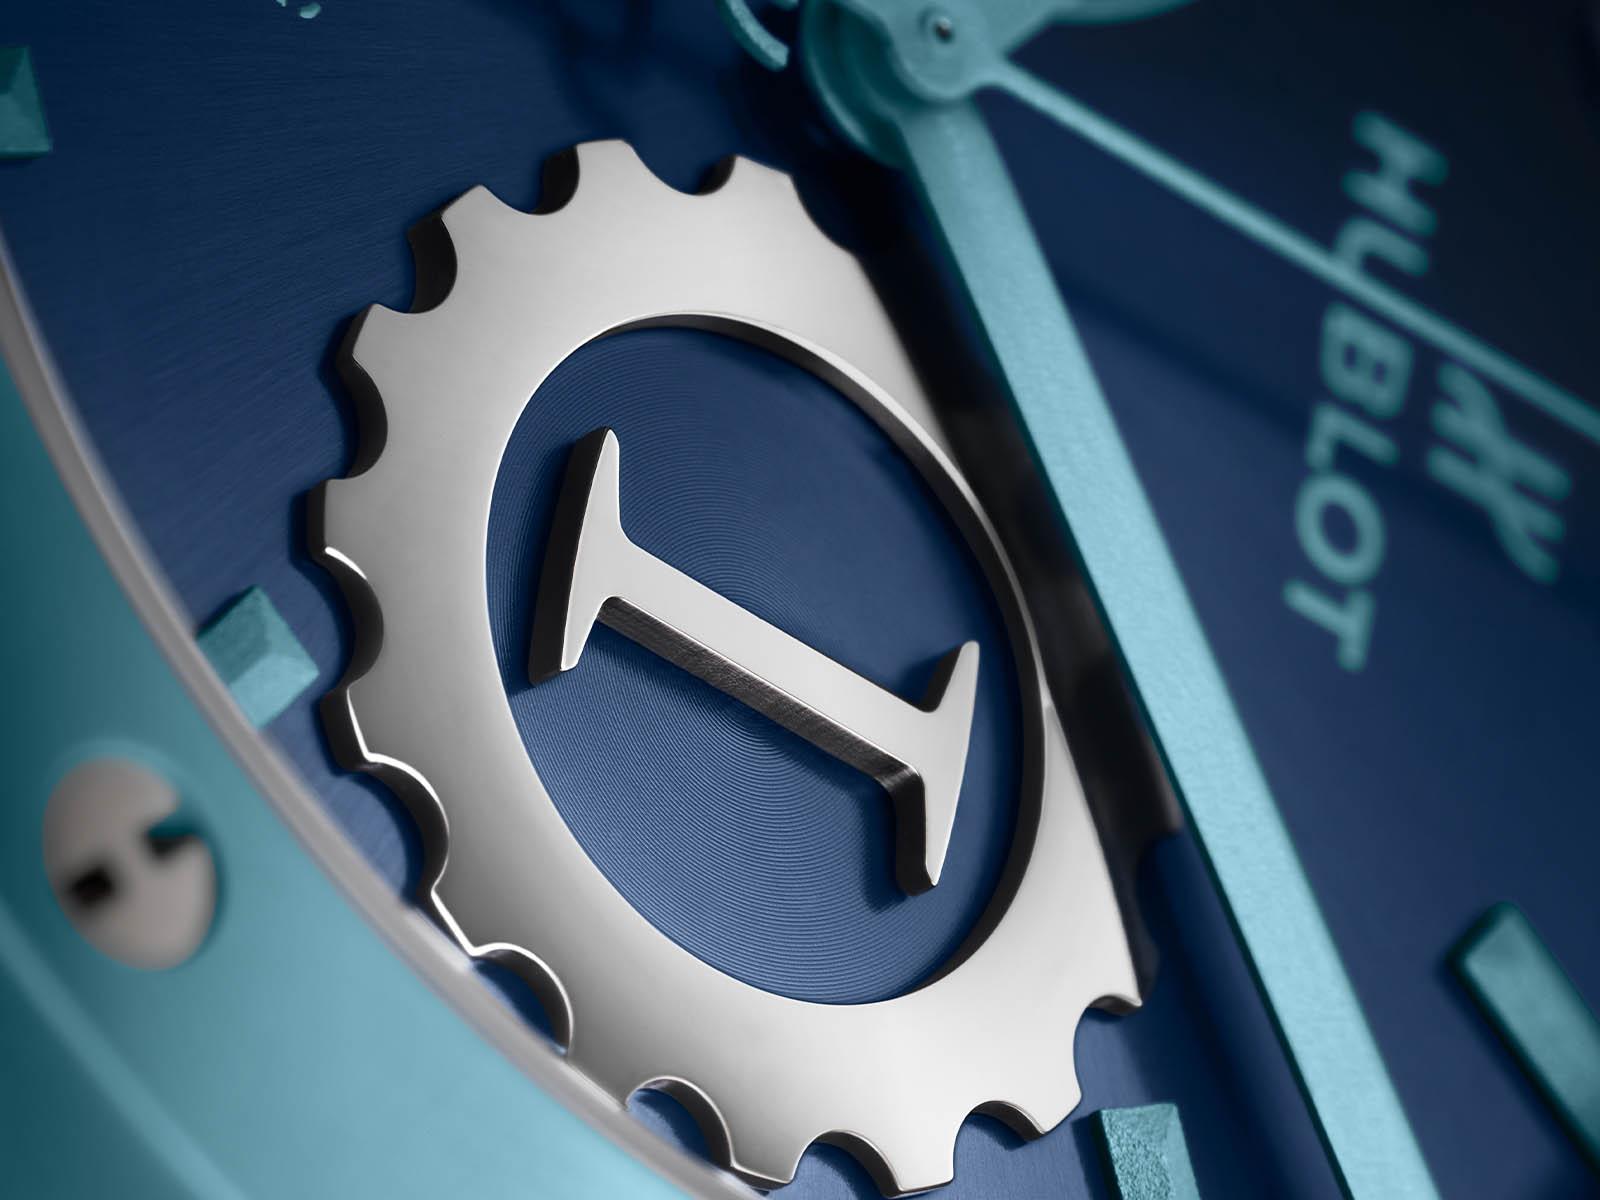 hublot-classic-fusion-chronograph-garage-italia-521-ex-7170-rx-git19-7.jpg